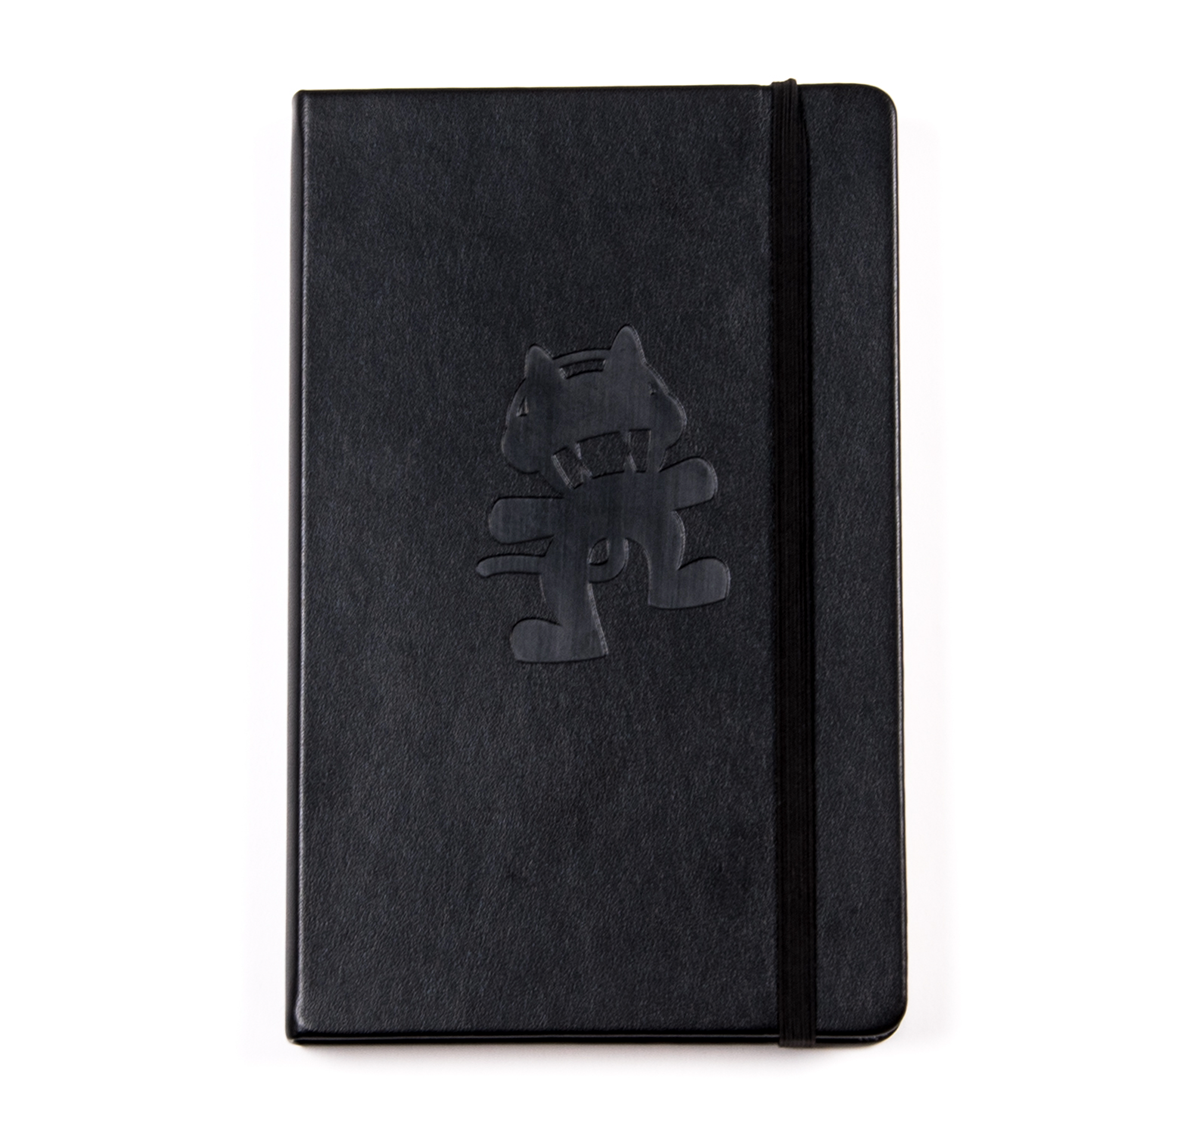 Monstercat - blank notebook https://shop.monstercat.com/products/monstercat-notebook-logo